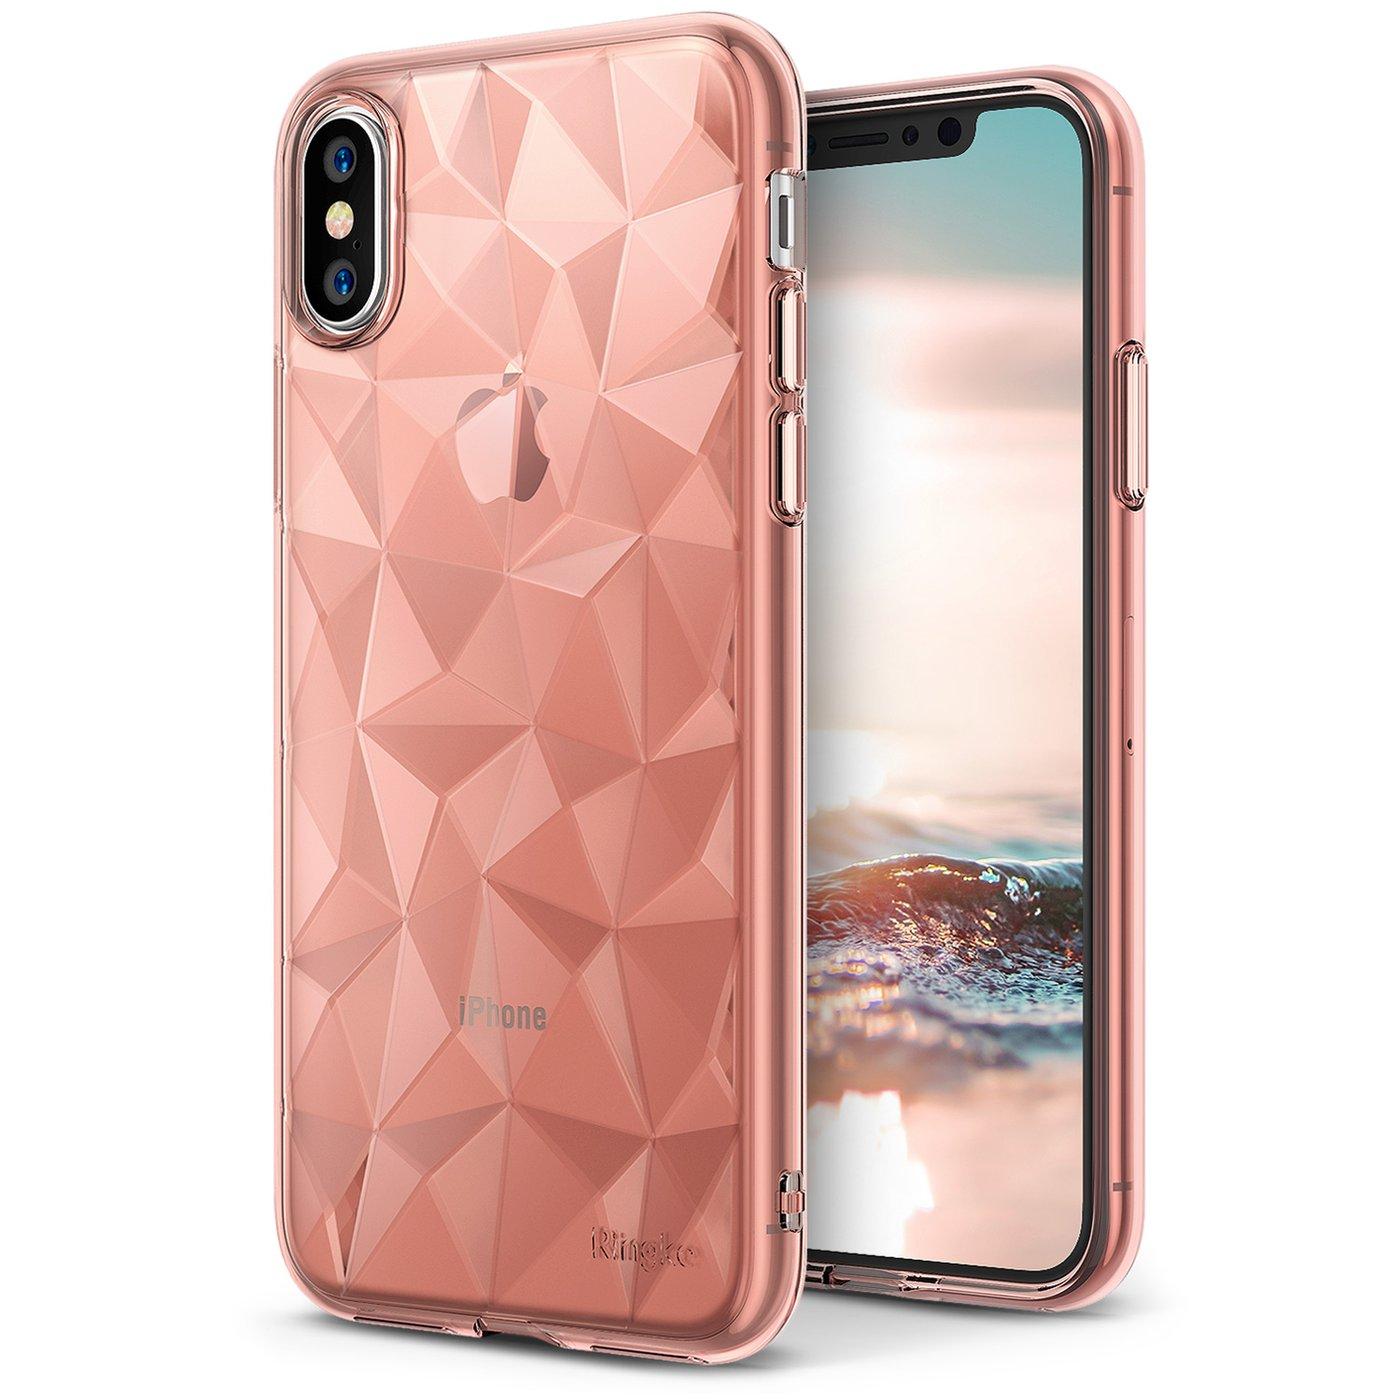 iPhone X, [AIR PRISM] Rose Gold [Sale] – Ringke